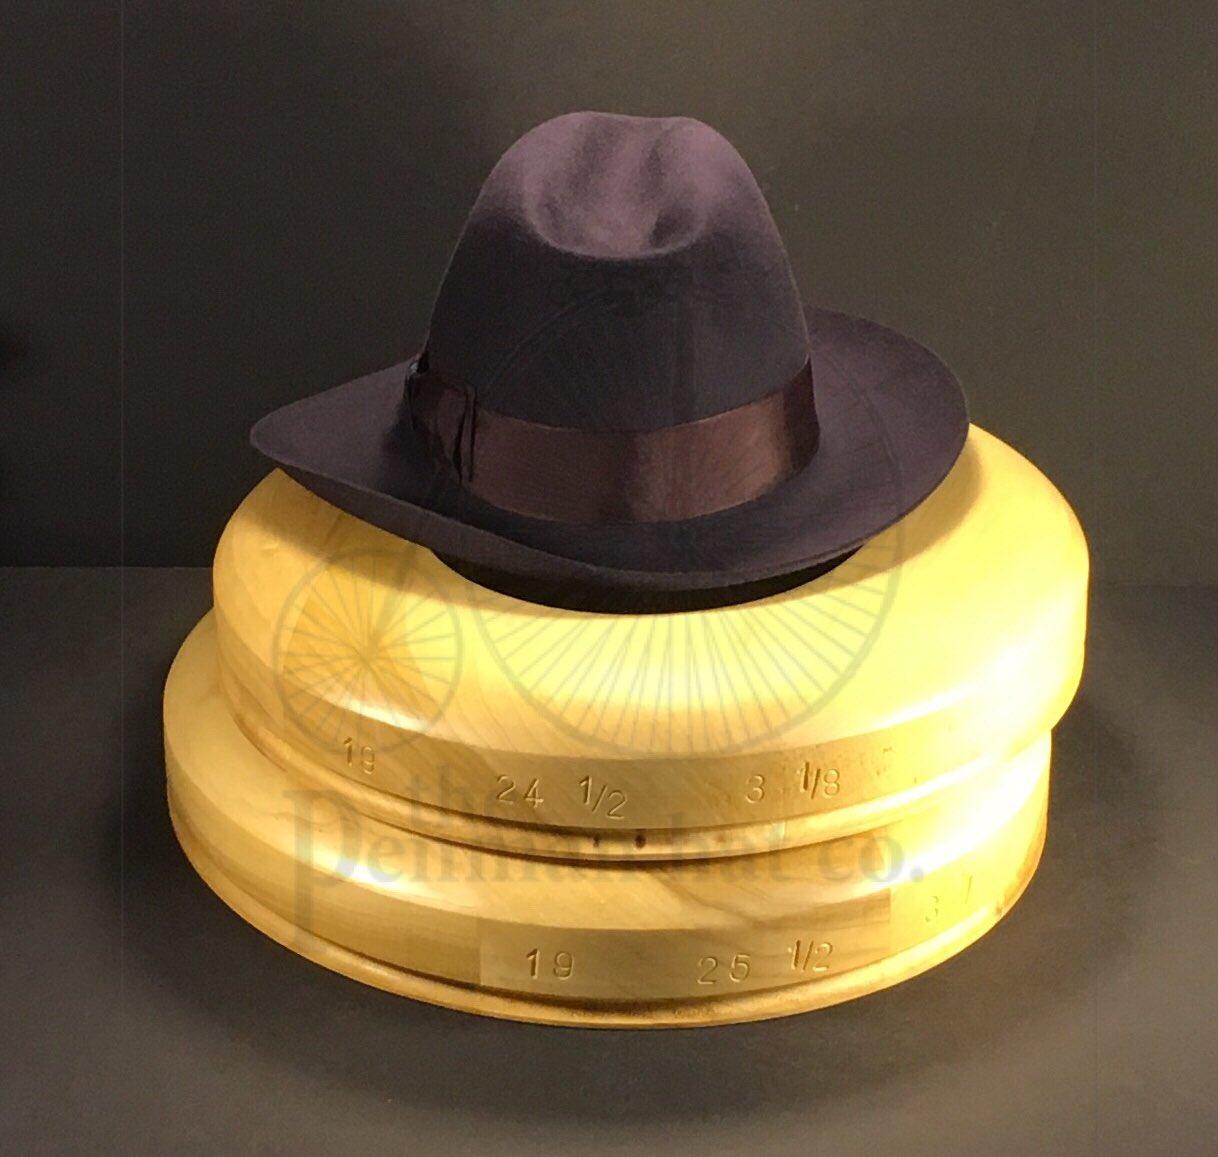 9186bc5b6 Penman Hat Company on Twitter: